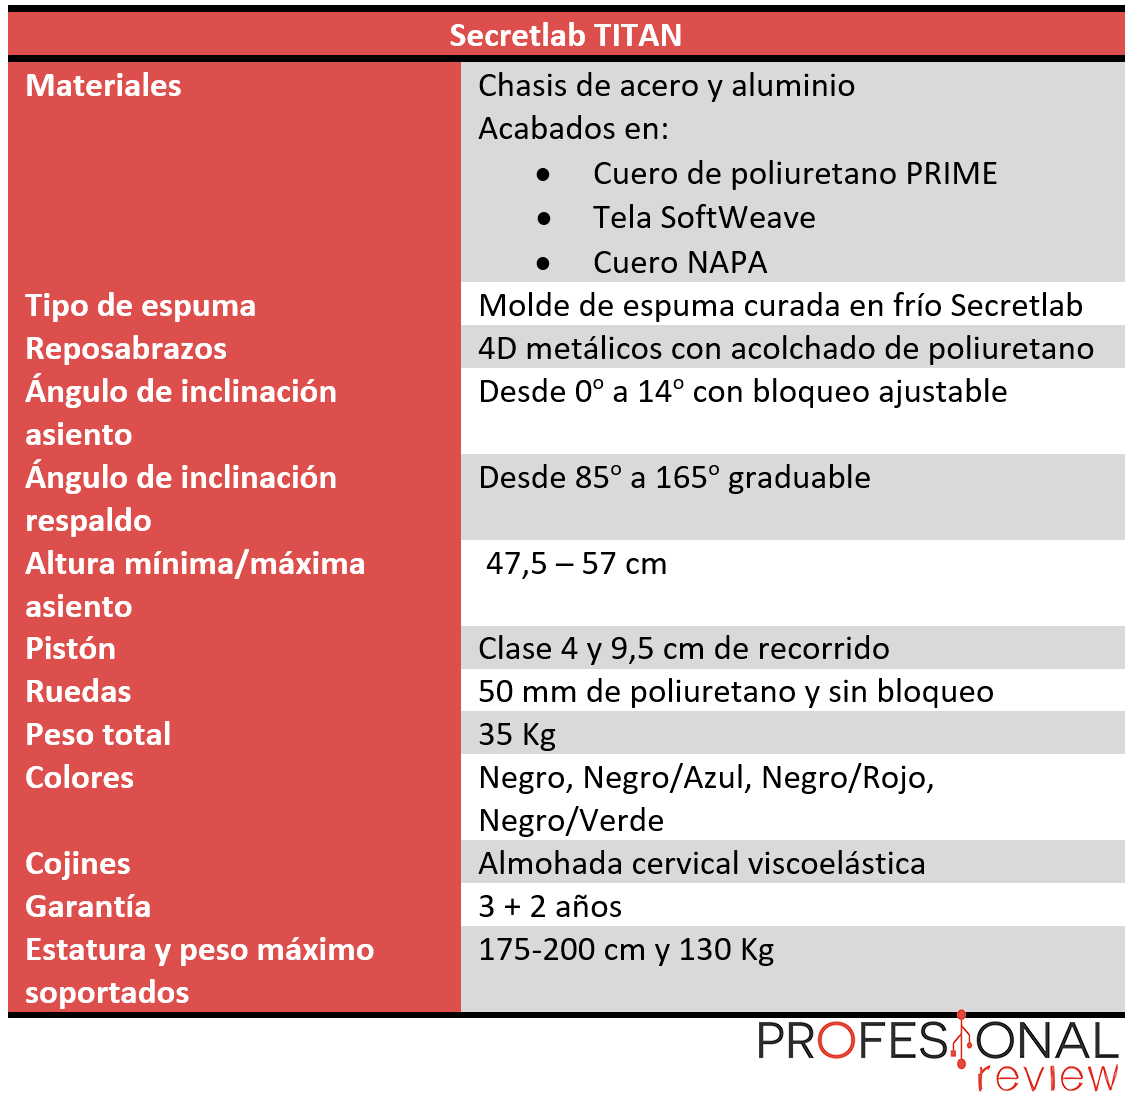 Secretlab TITAN Características